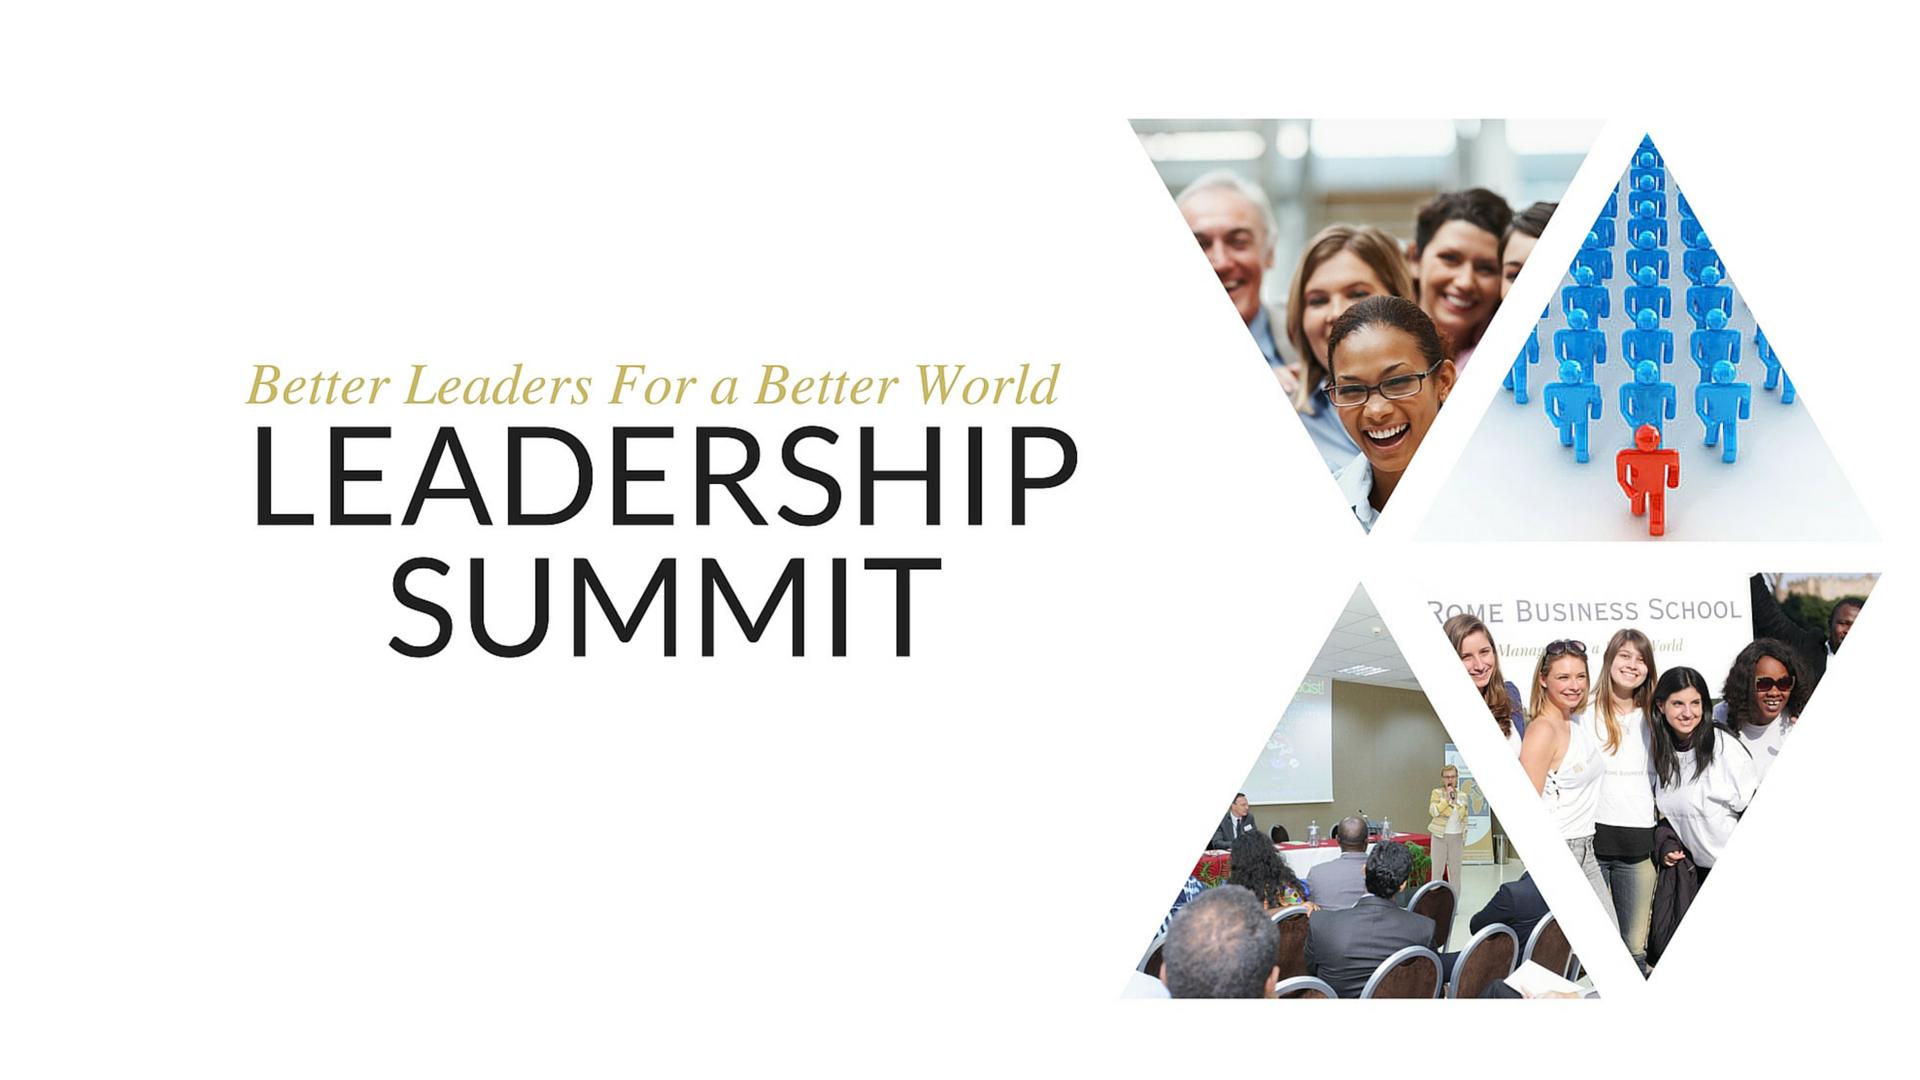 Leadership summit Rome Busines Schoo